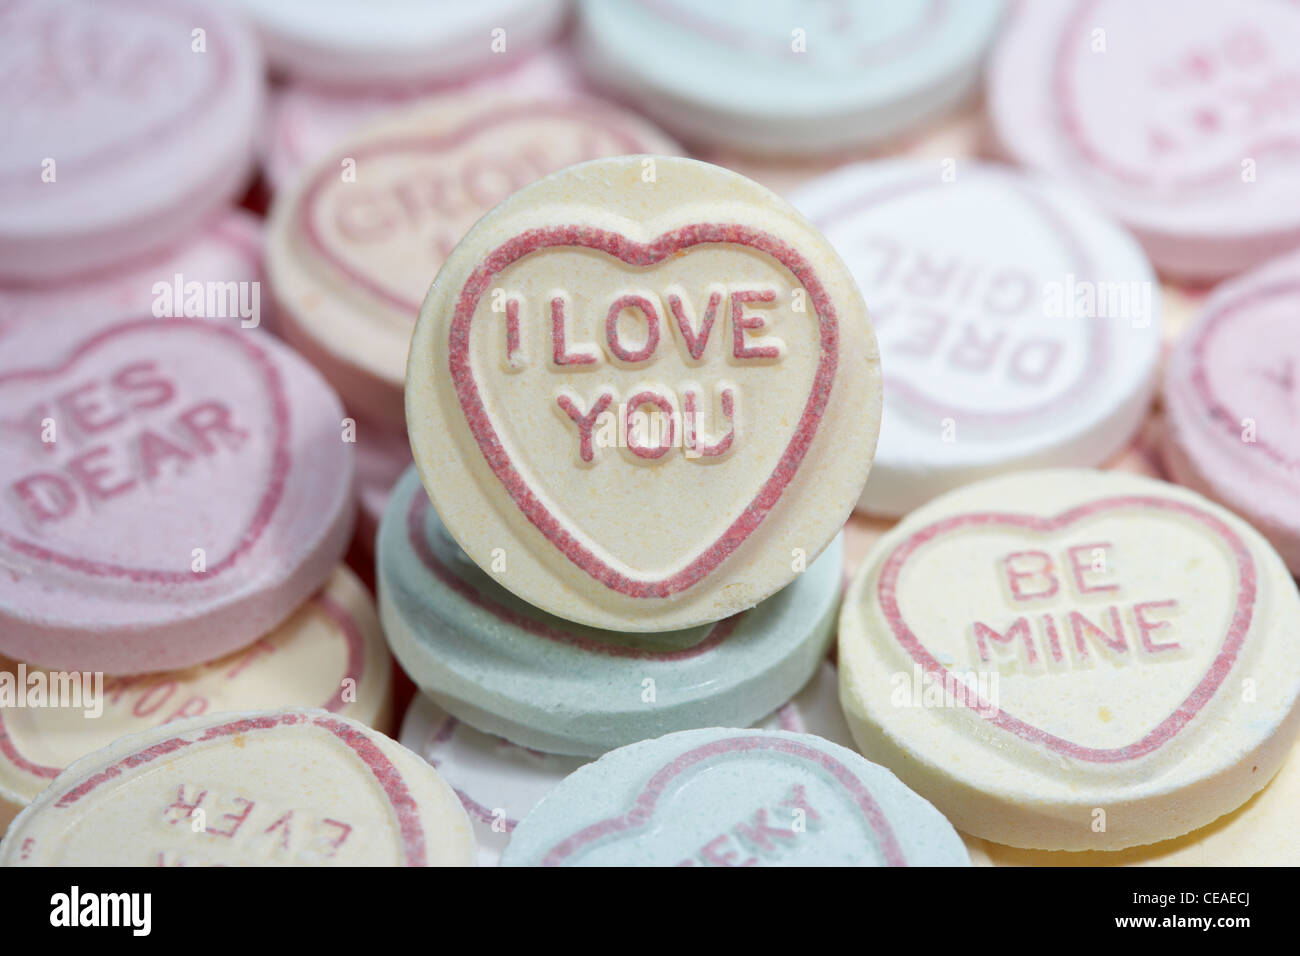 I Love You Amongst Love Heart Sweets Stock Photo 43256770 Alamy